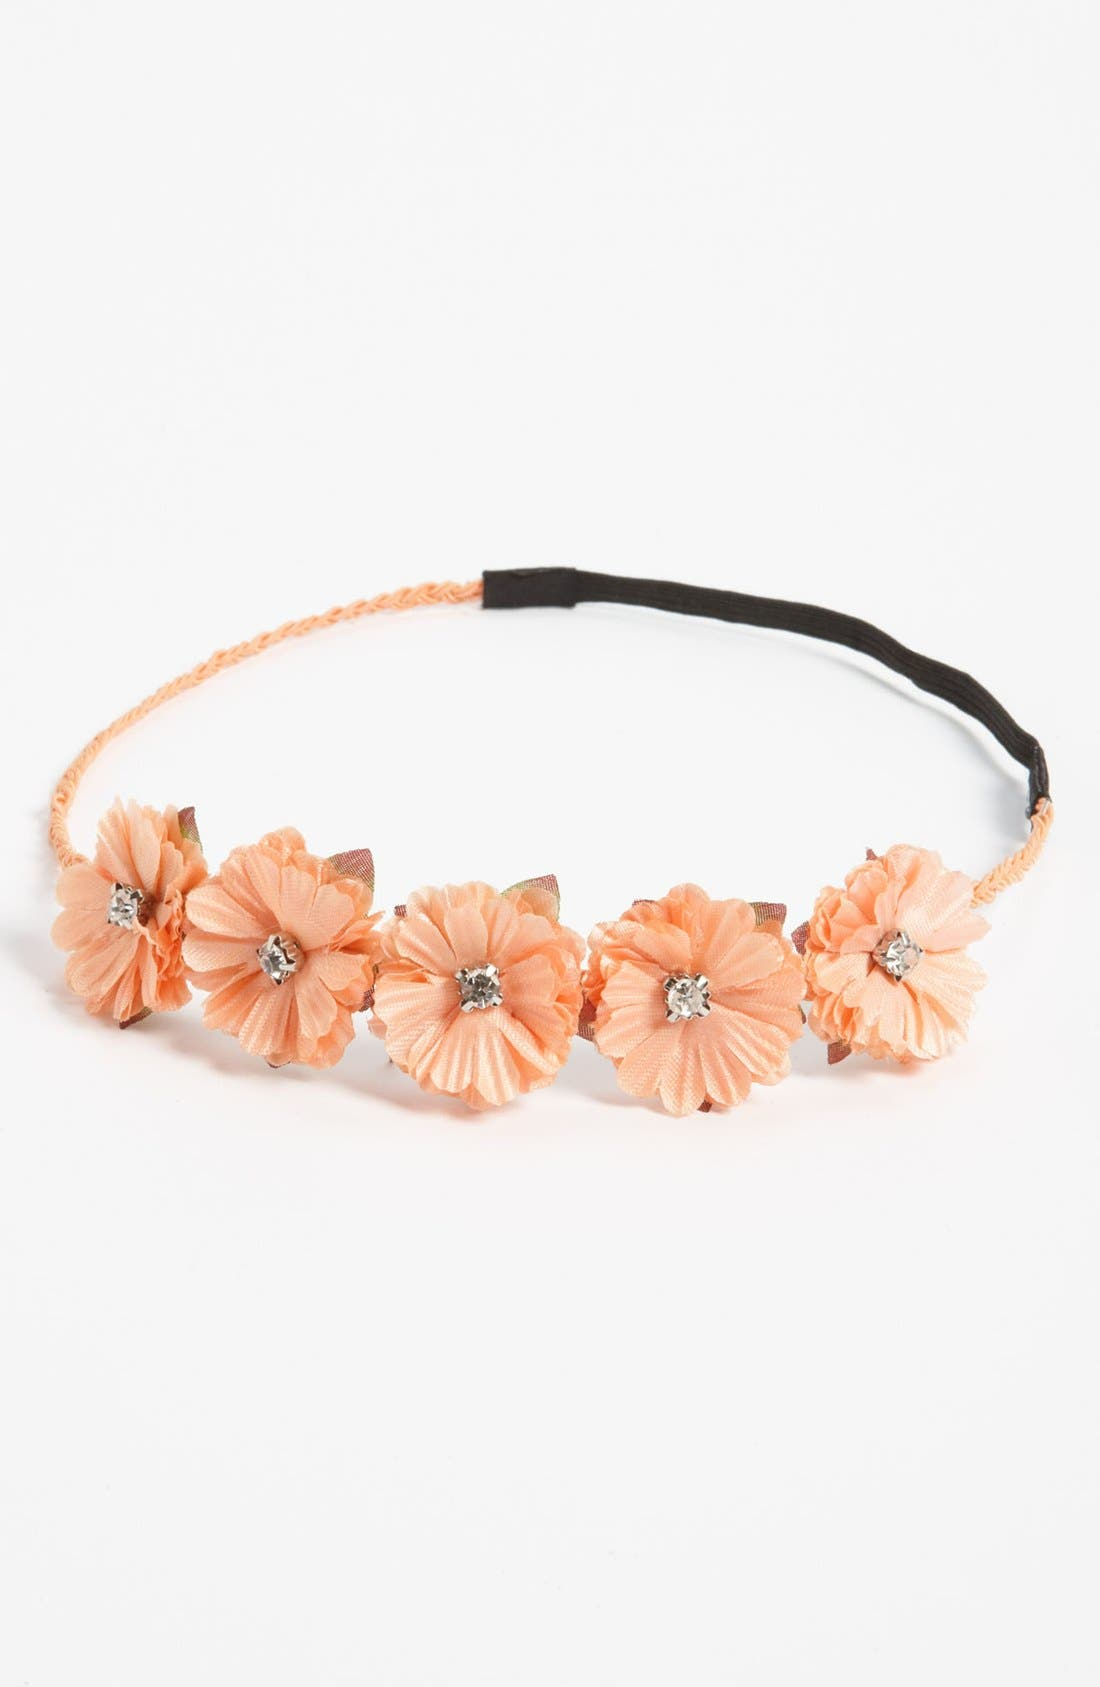 Main Image - Carole Rhinestone Accent Floral Headband